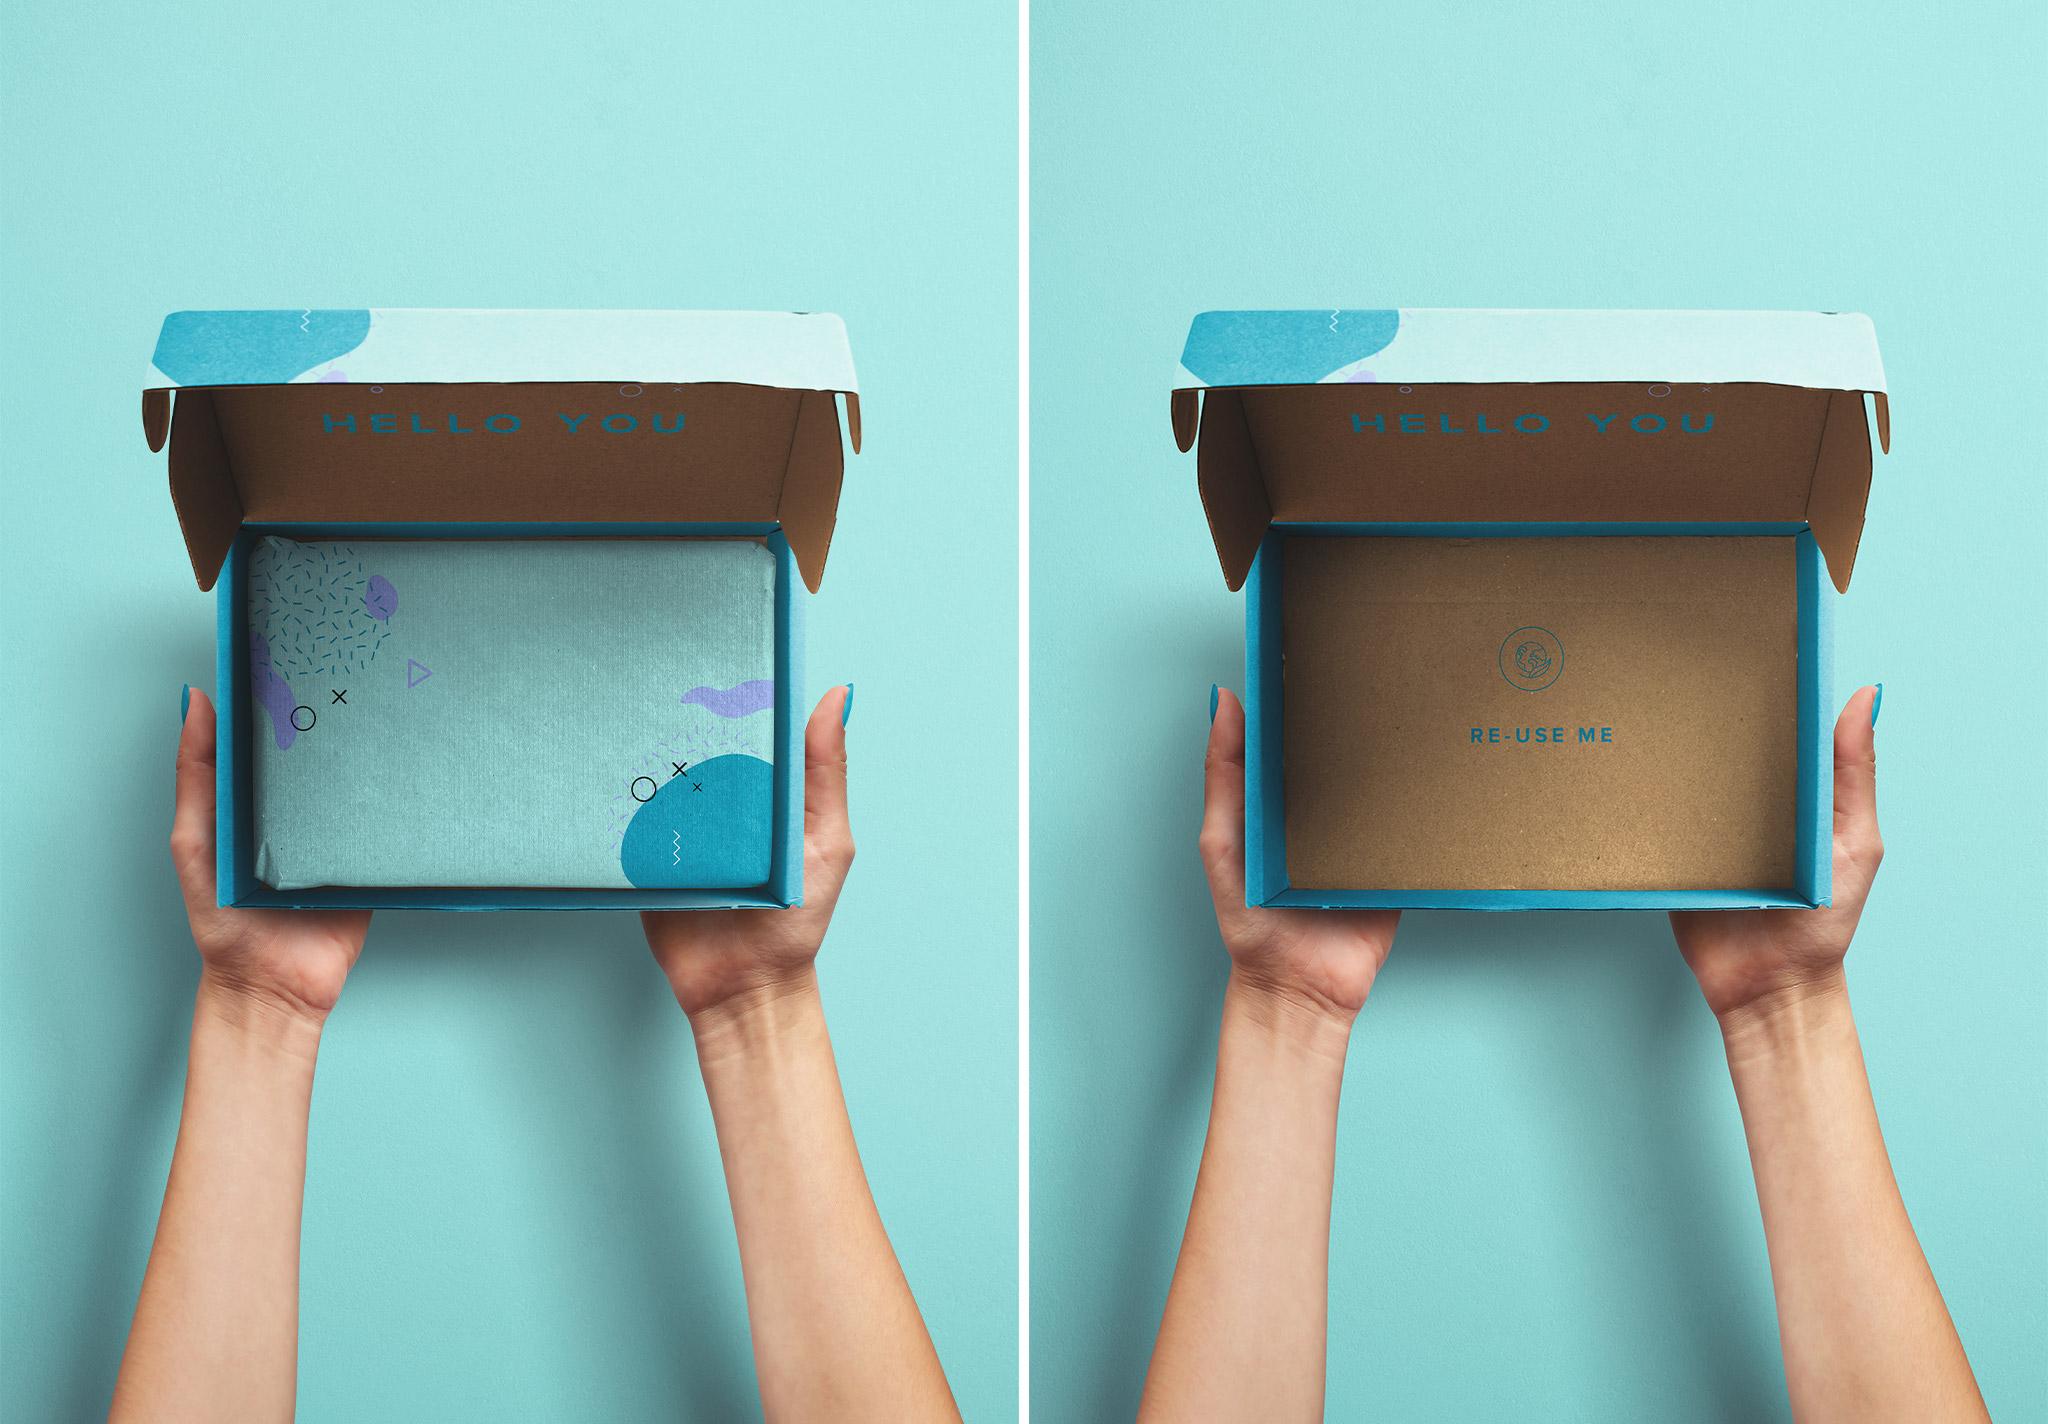 Hands Holding Opened Postal Box Mockup image03